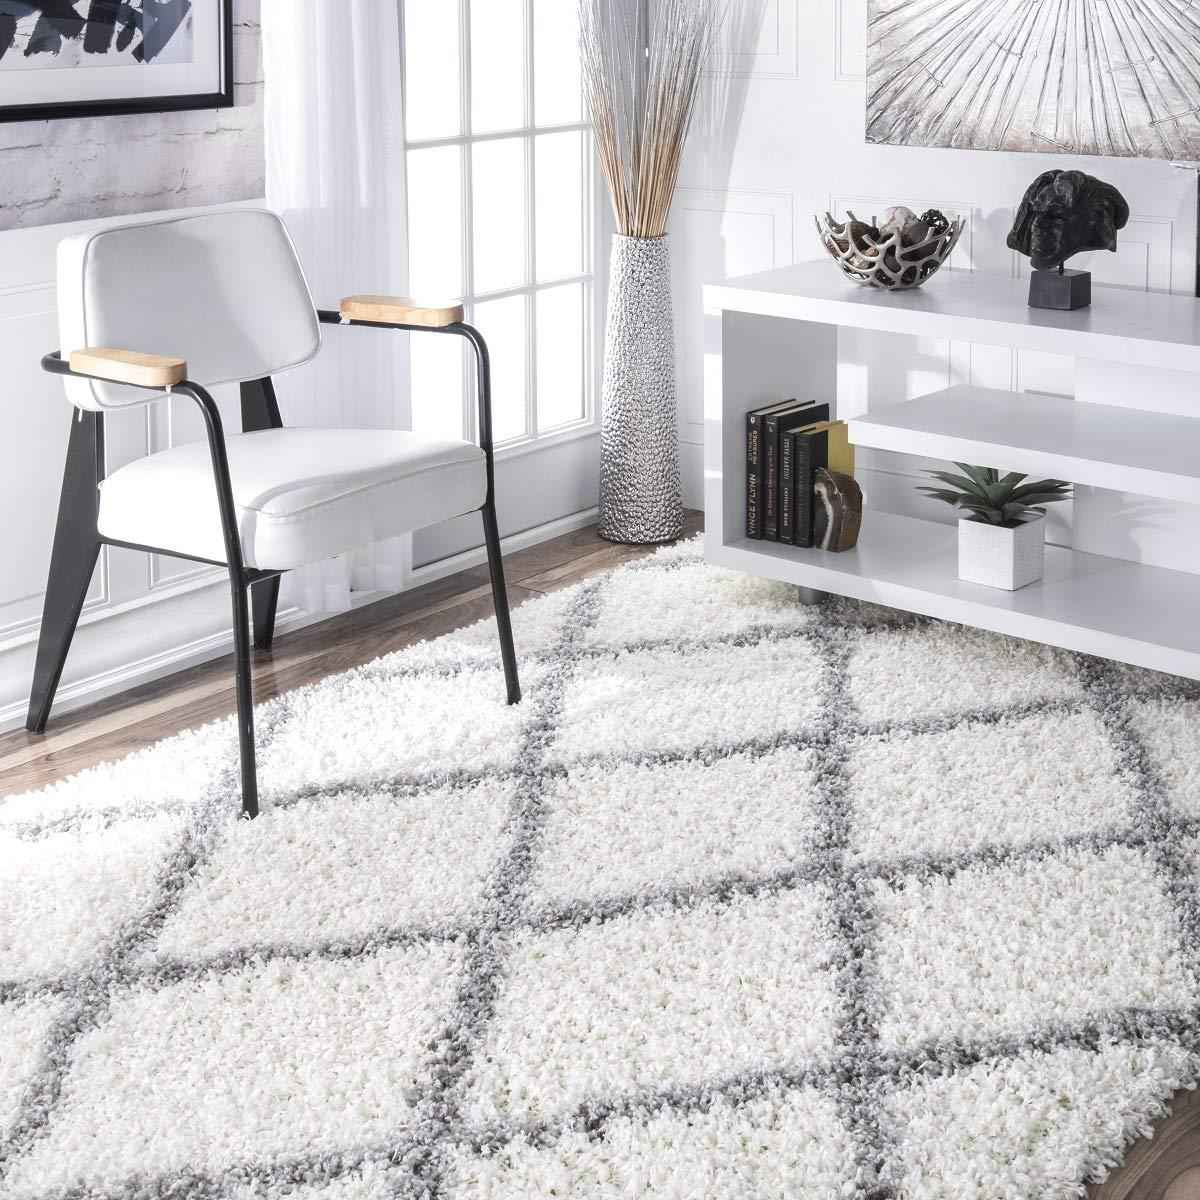 nuLOOM Cozy Soft and Plush Diamond Trellis Shag Area Rug, White, 5' 3'' x 7' 6''